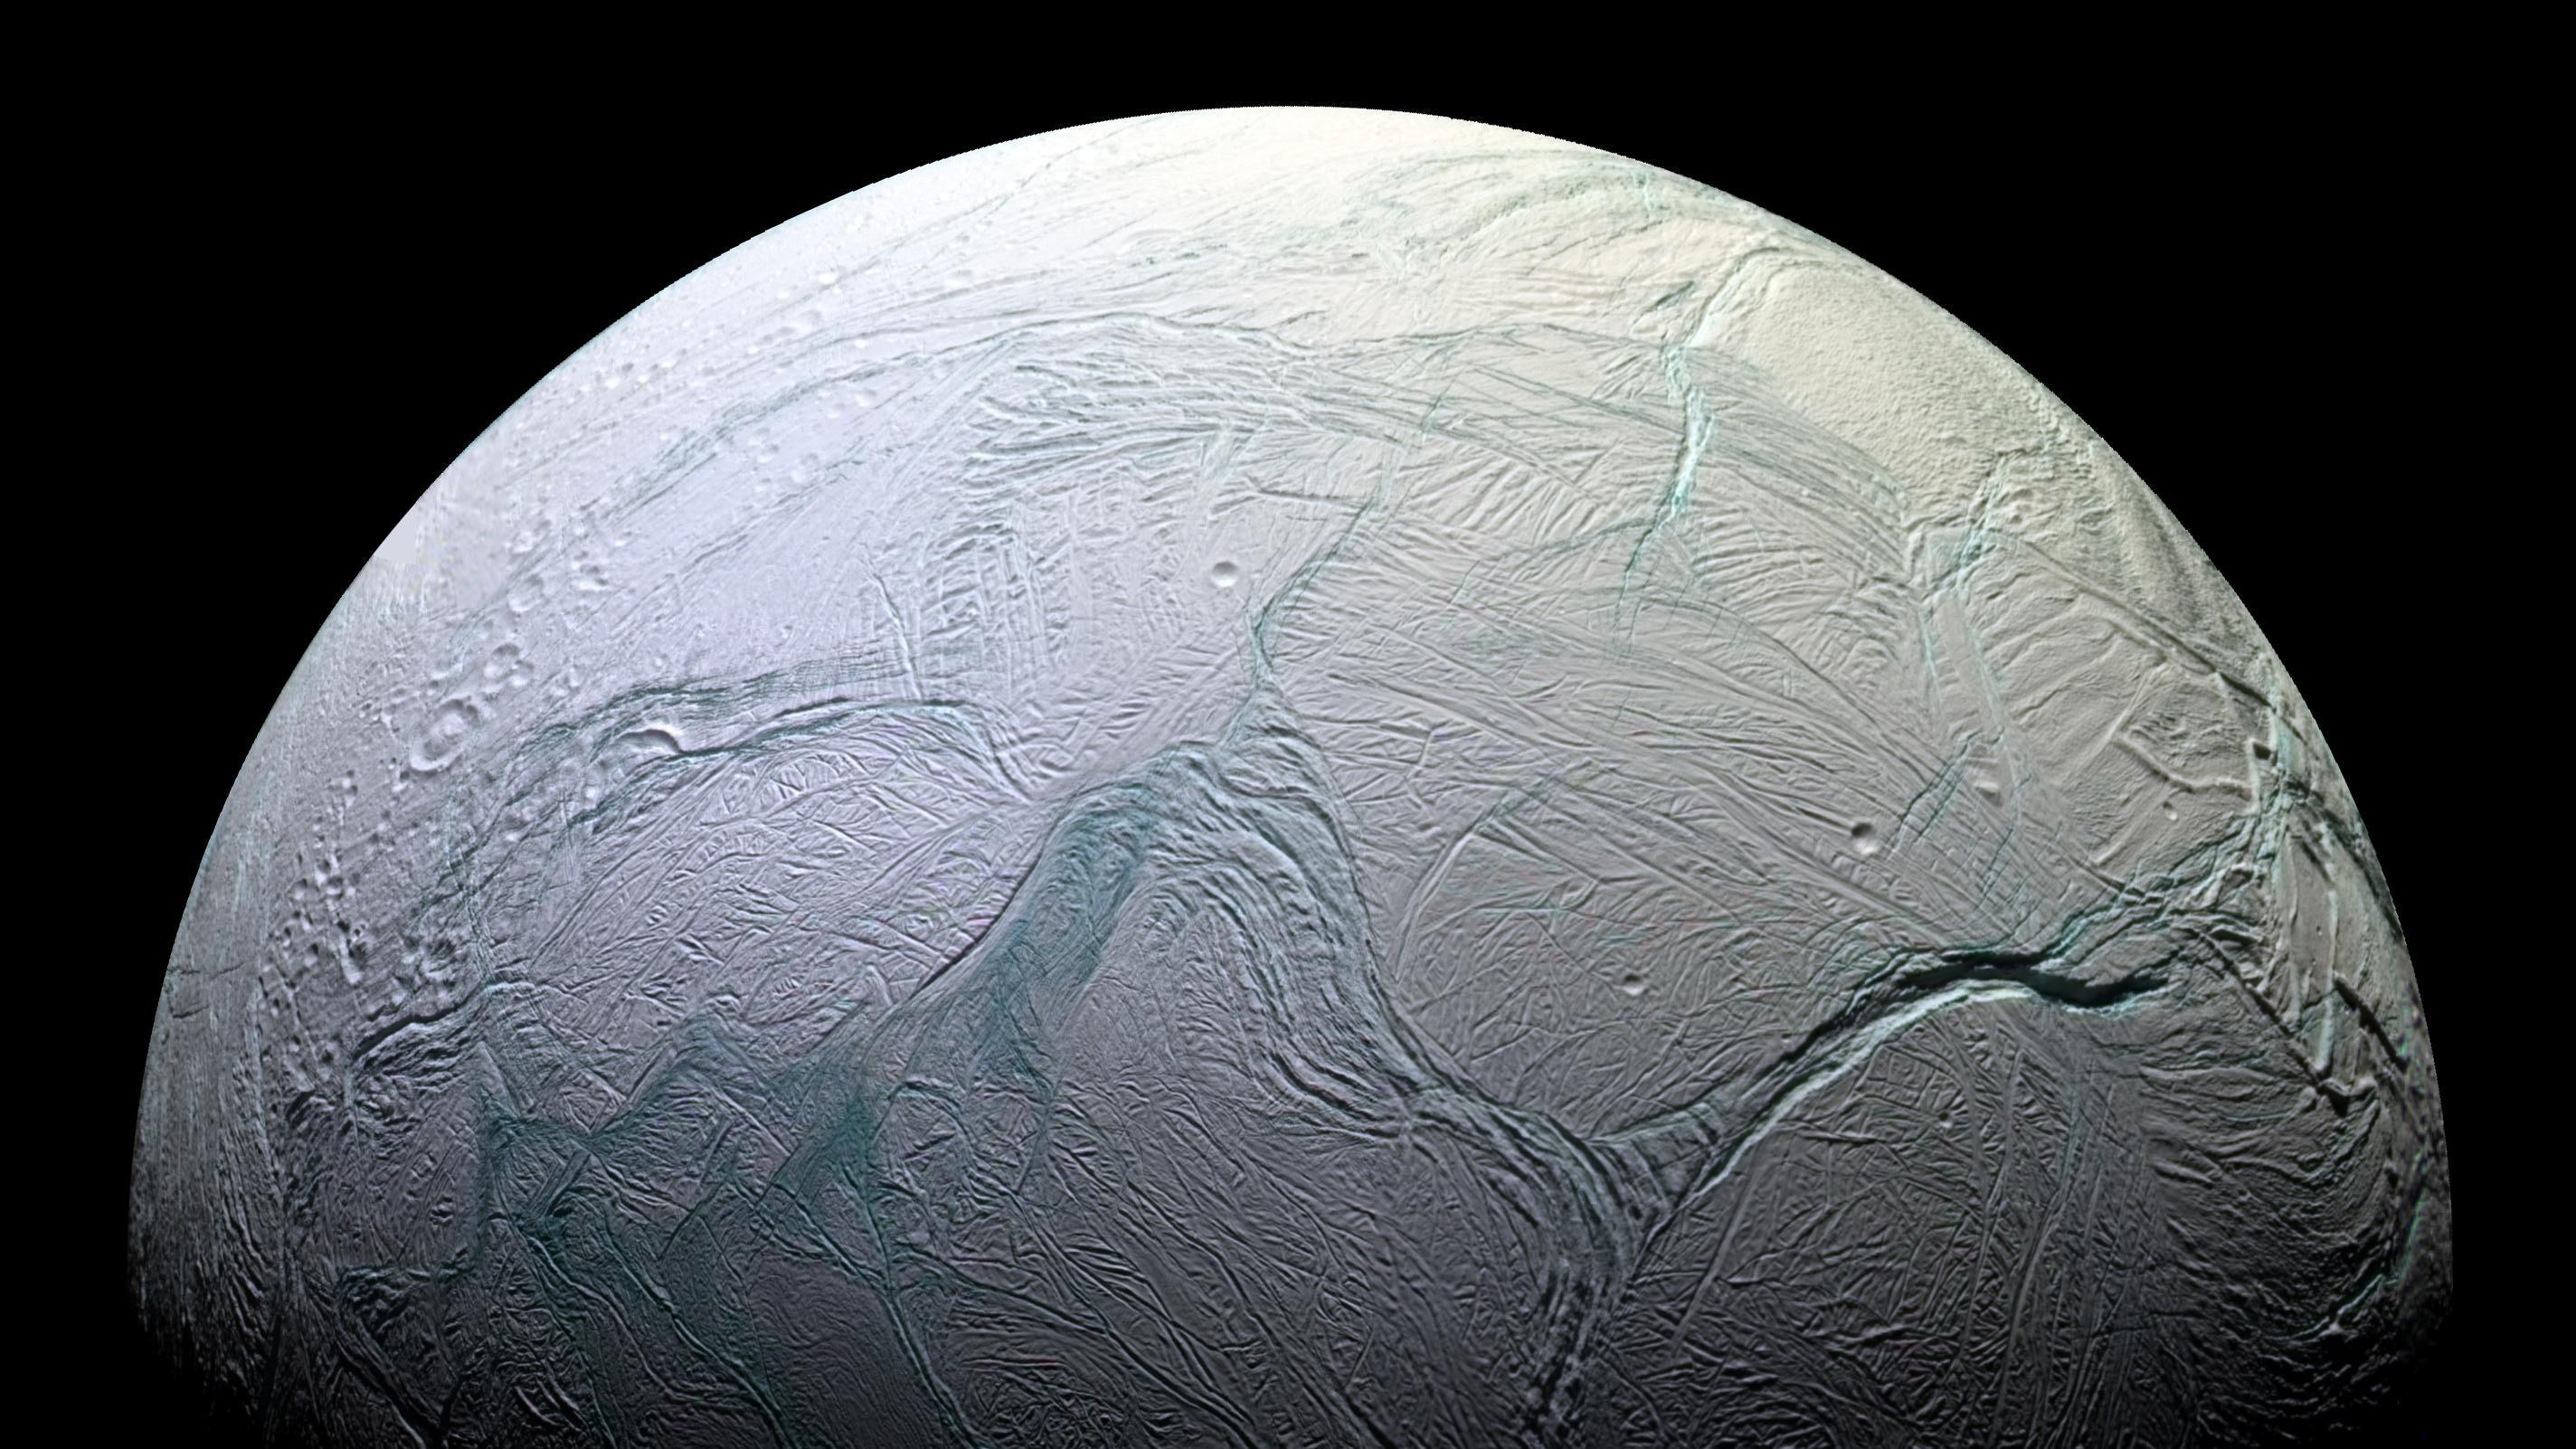 Saturn's Moon Enceladus Has The Basic Ingredients For Life